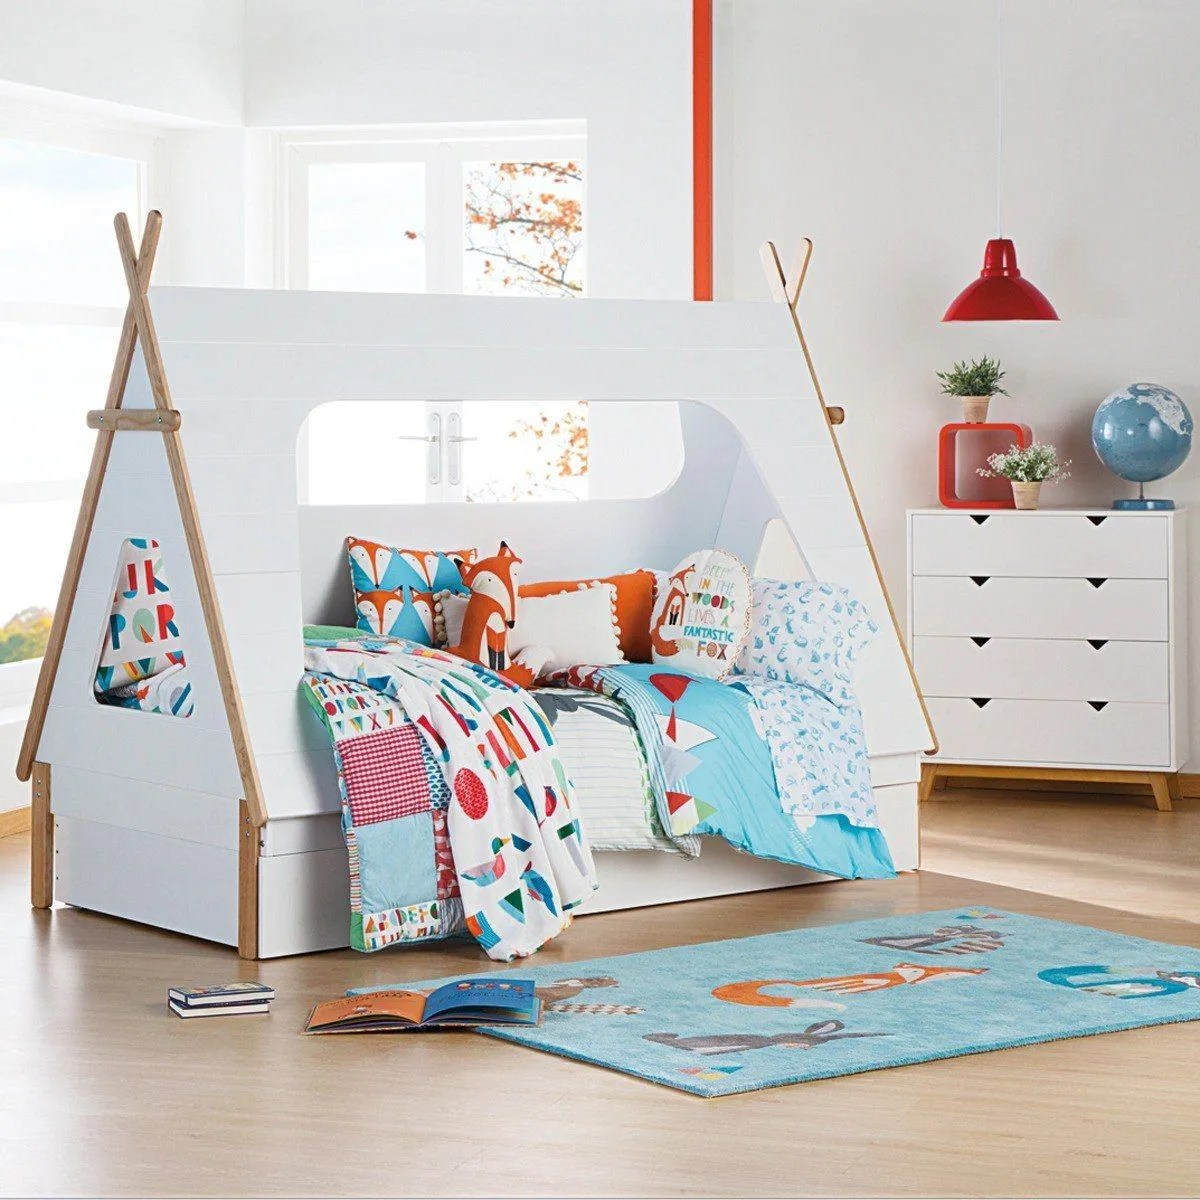 Decoracin de dormitorios para nios  Tendencias 2018